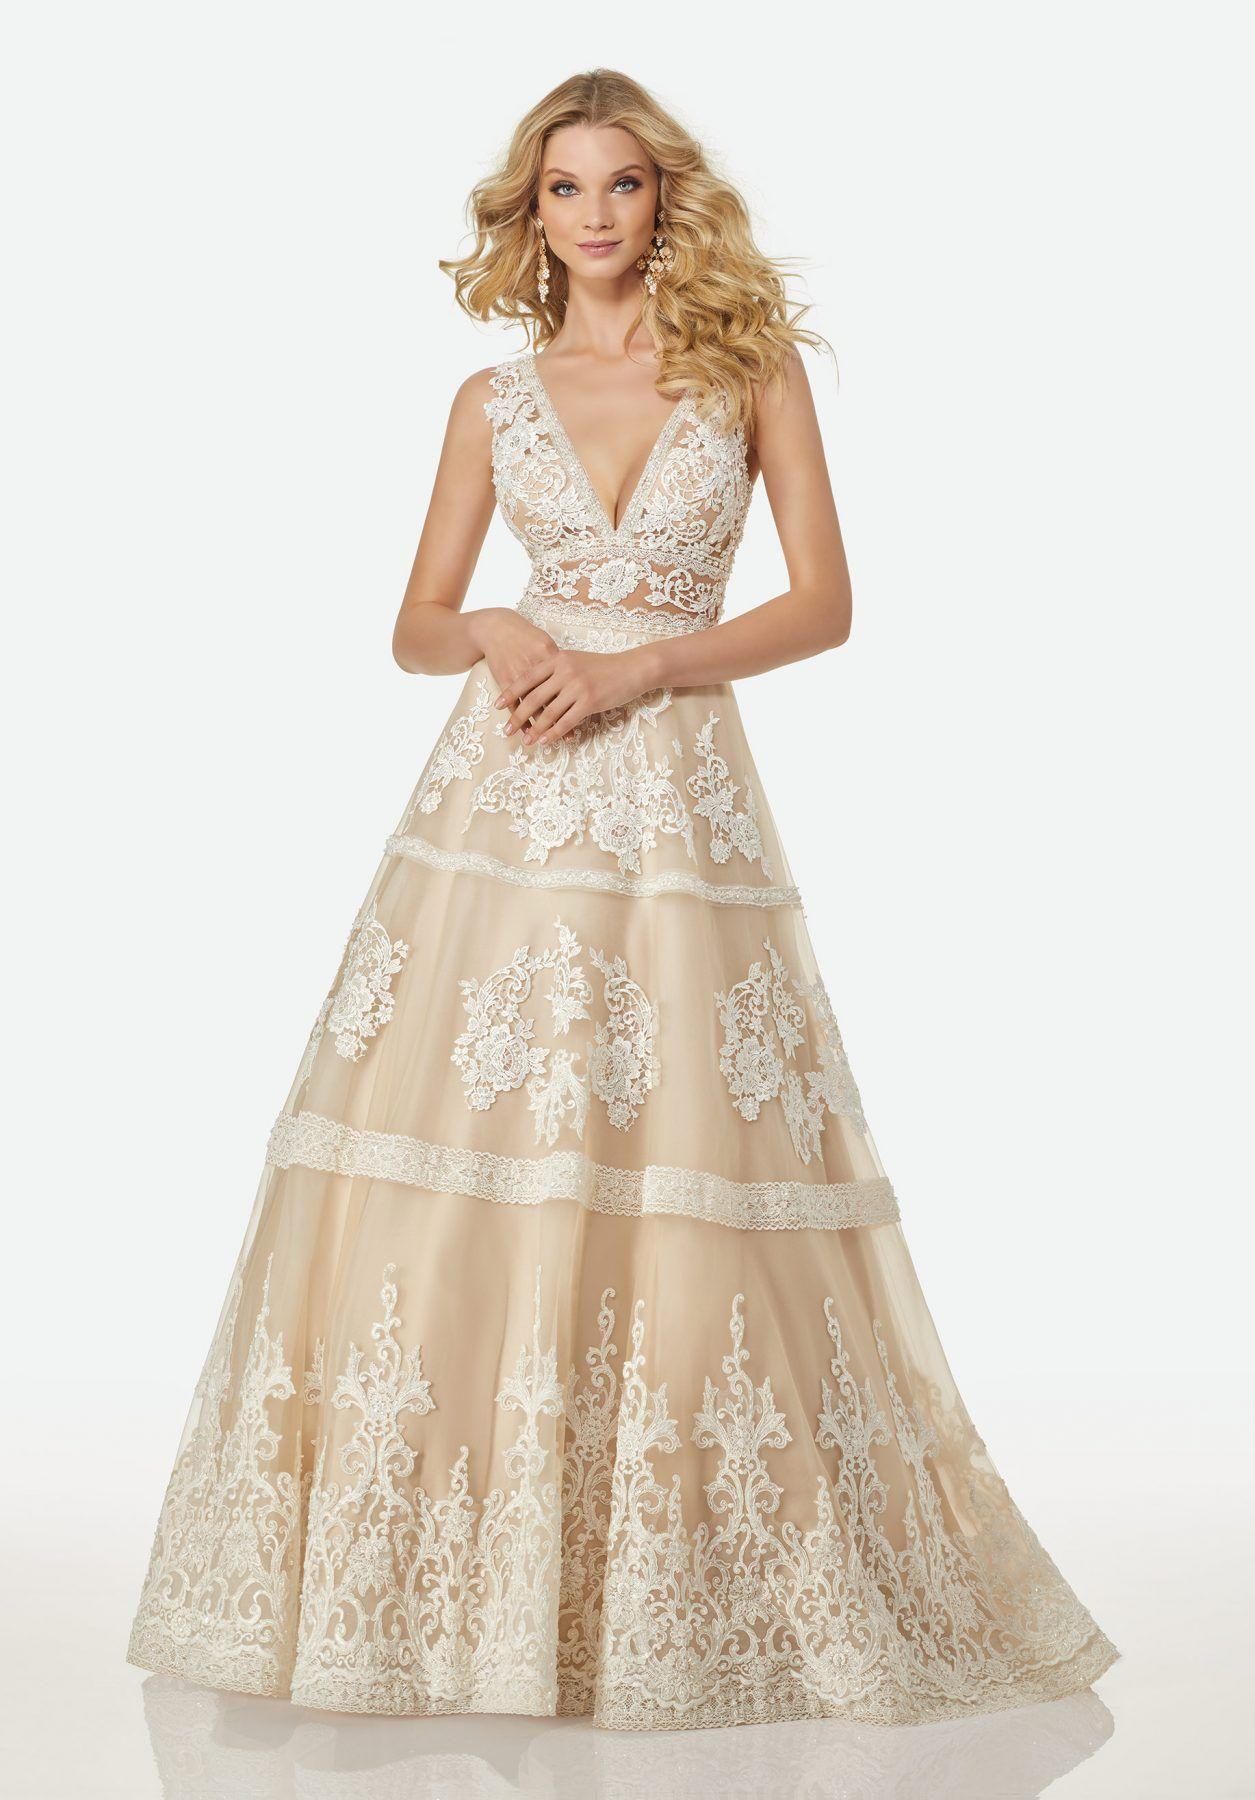 Bohemian Aline Wedding Dress by Randy Fenoli Image 1